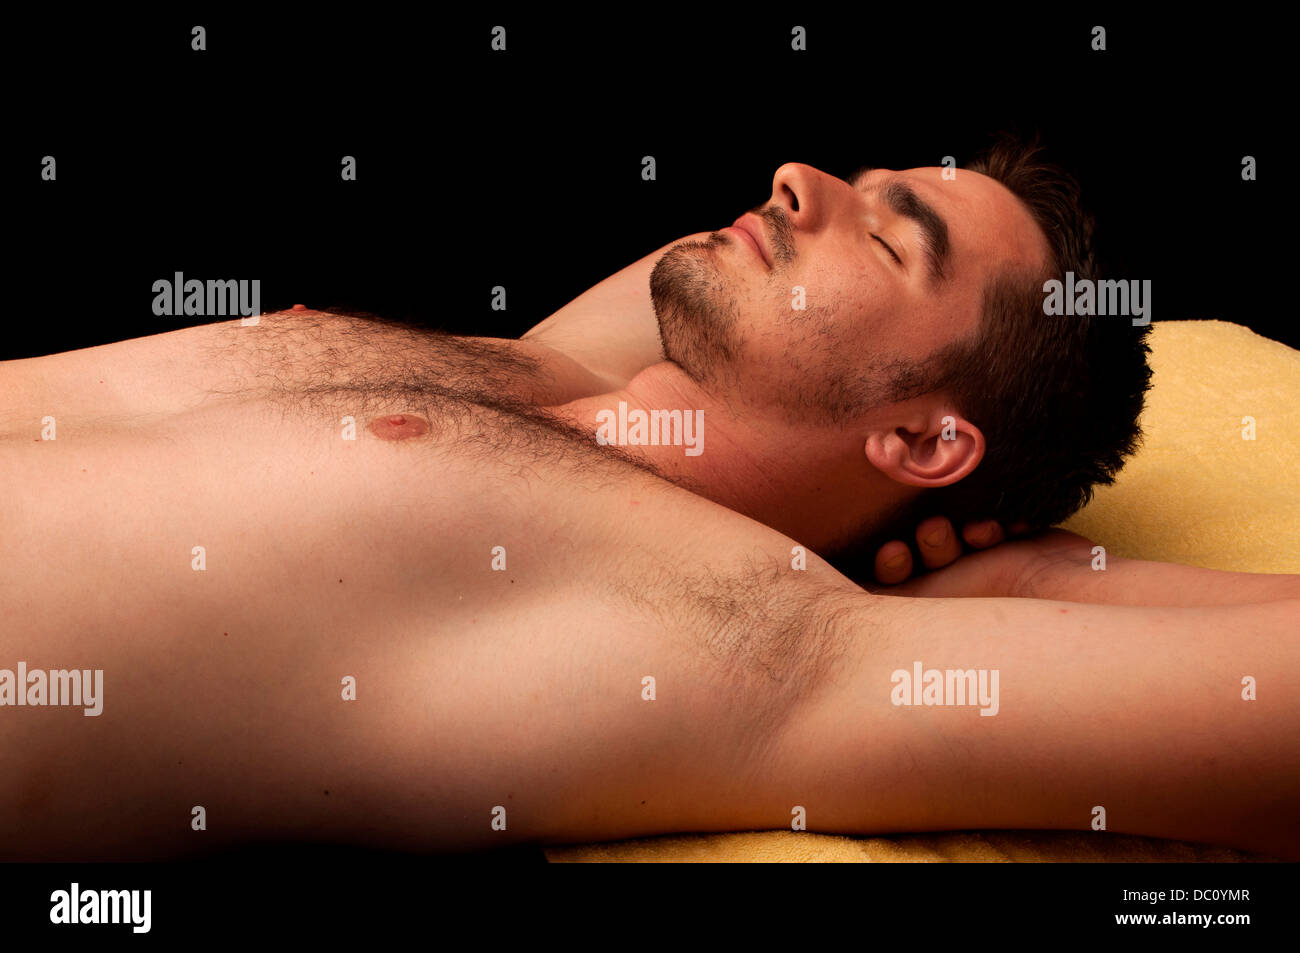 Adult pics hairy men asleep